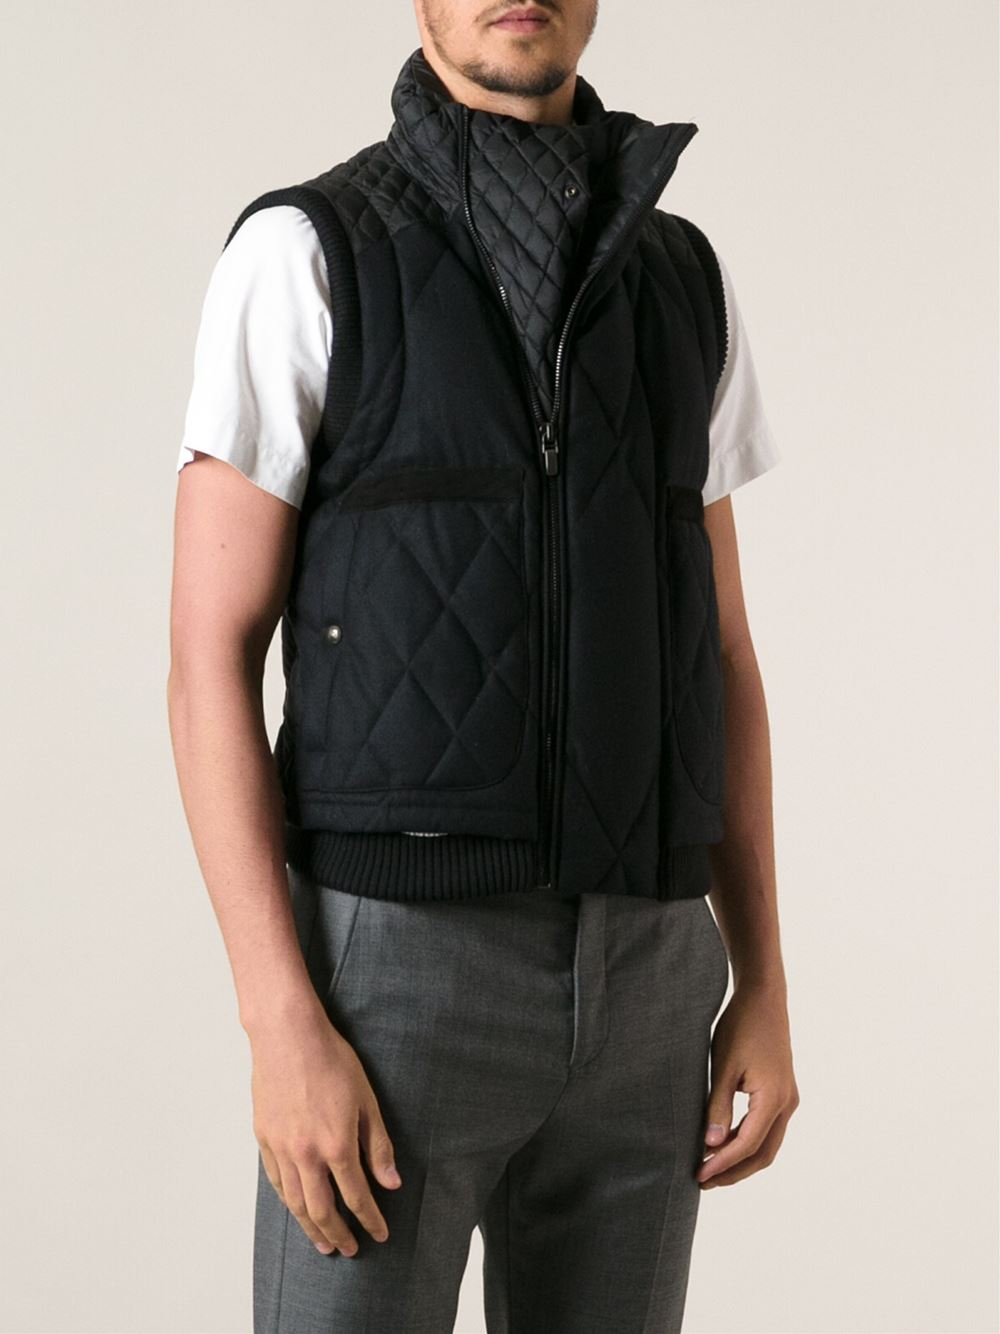 Moncler Gamme Bleu Leather Trimmed Padded Vest in Black for Men - Lyst 0377b3c7e0a